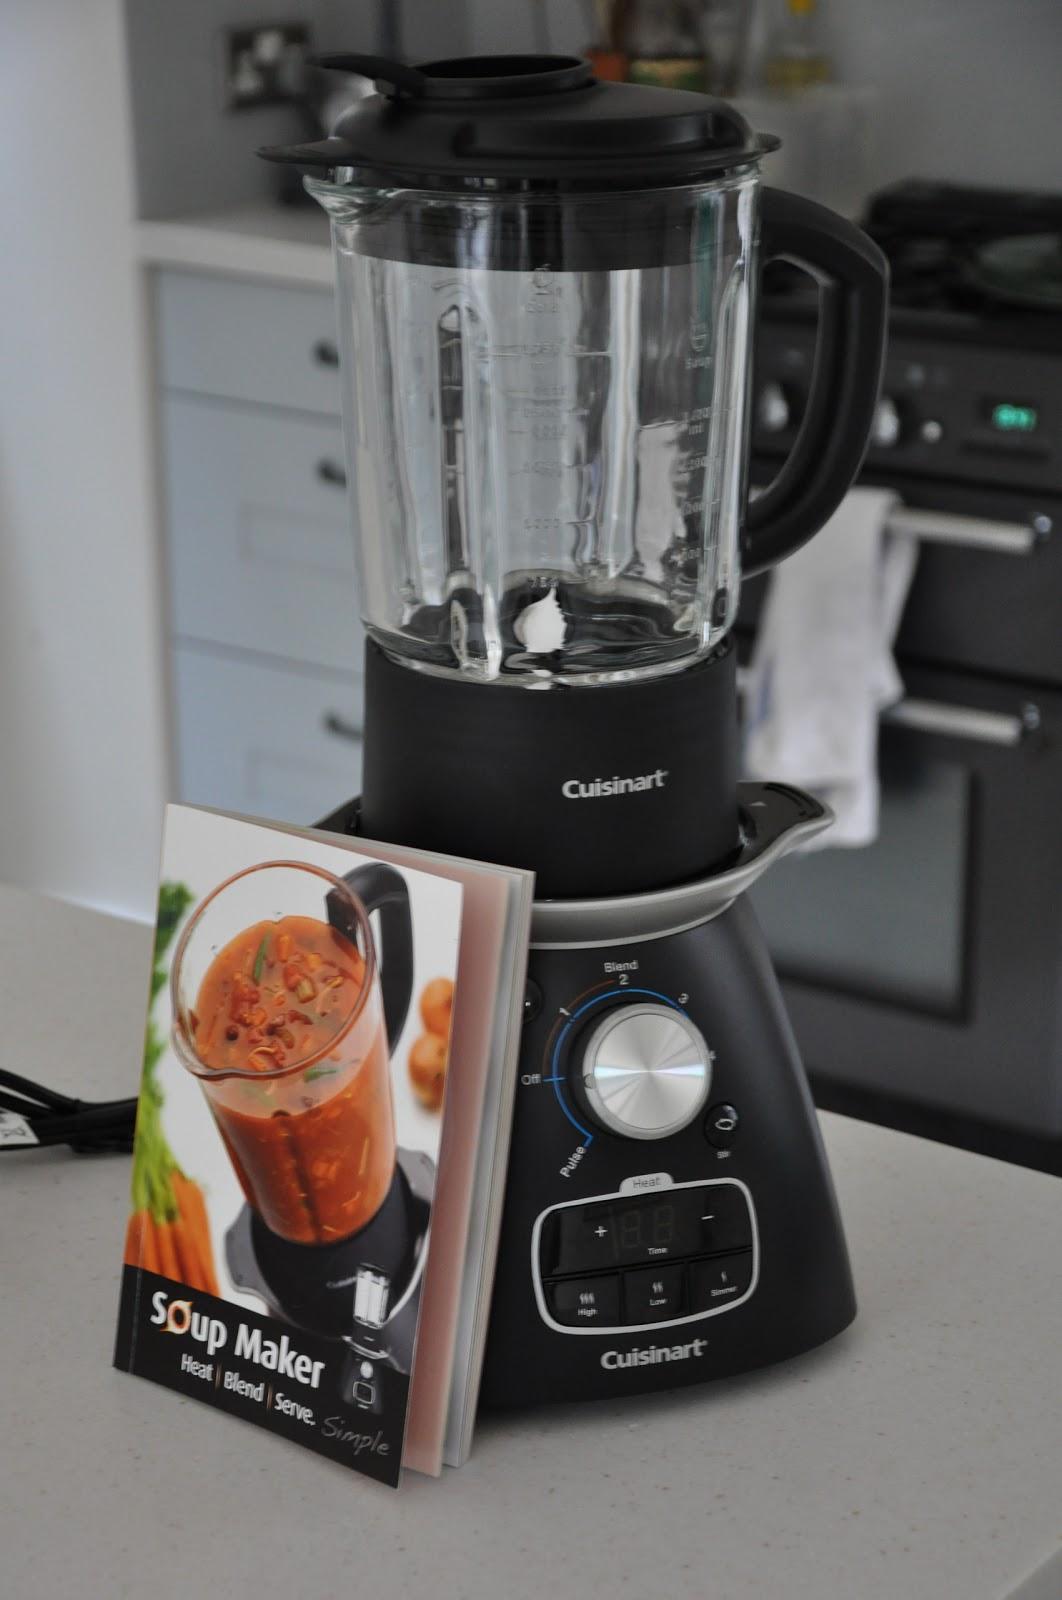 019fde4e81e Cuisinart Soup Maker Blender Recipes